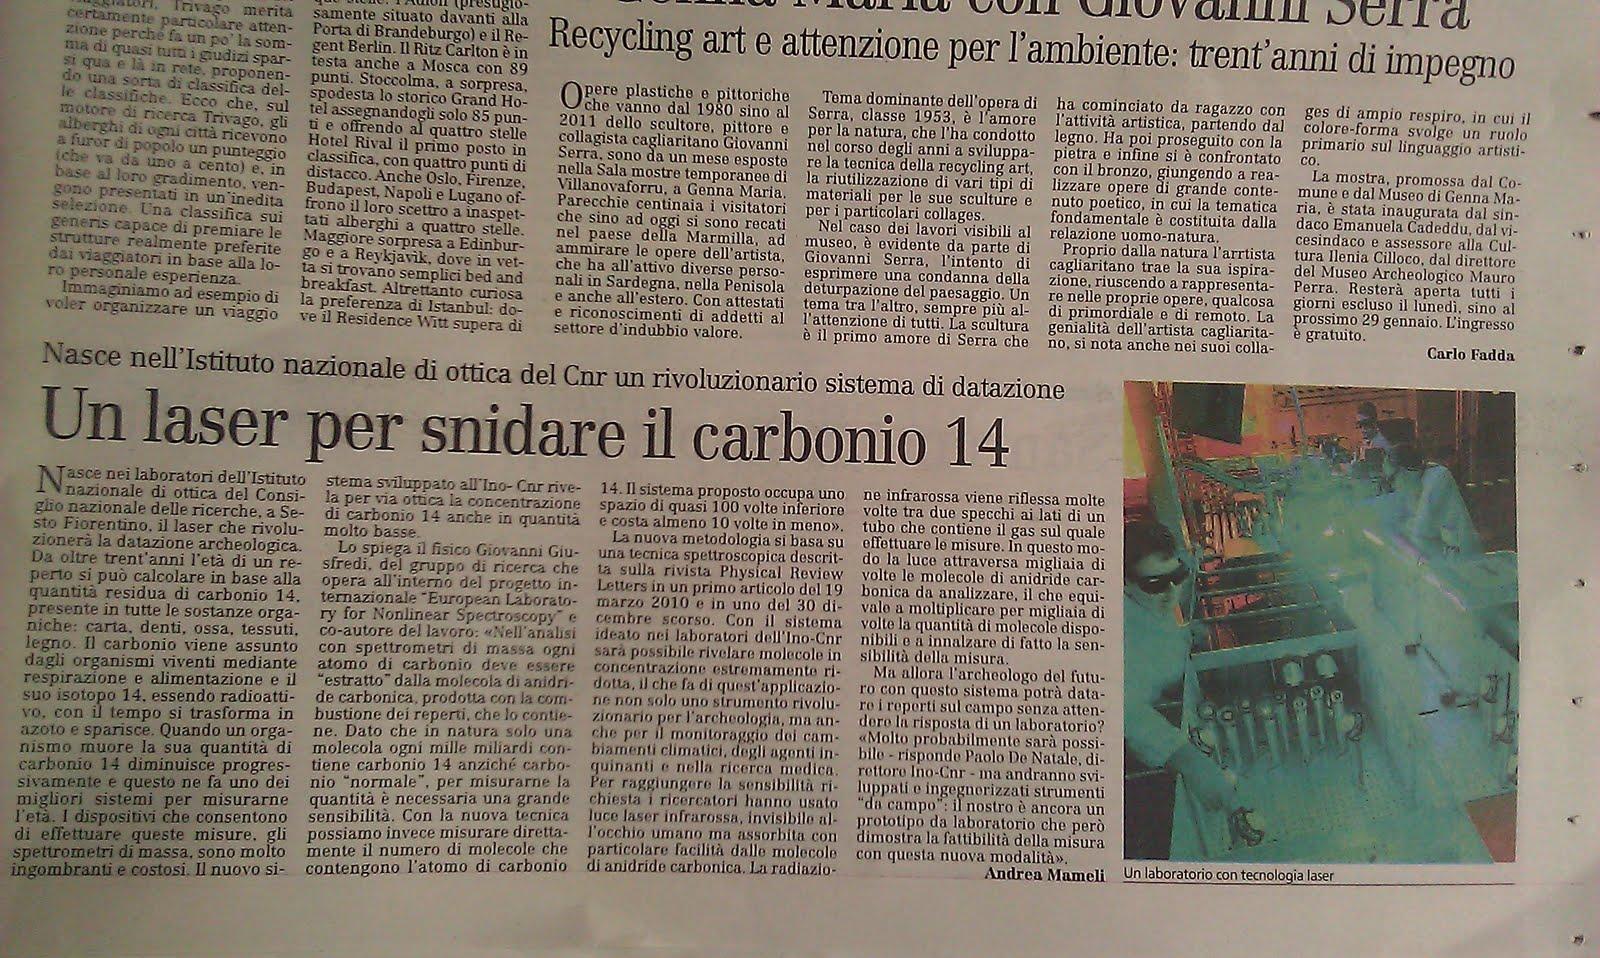 Datazione carbonio-14 disprovata